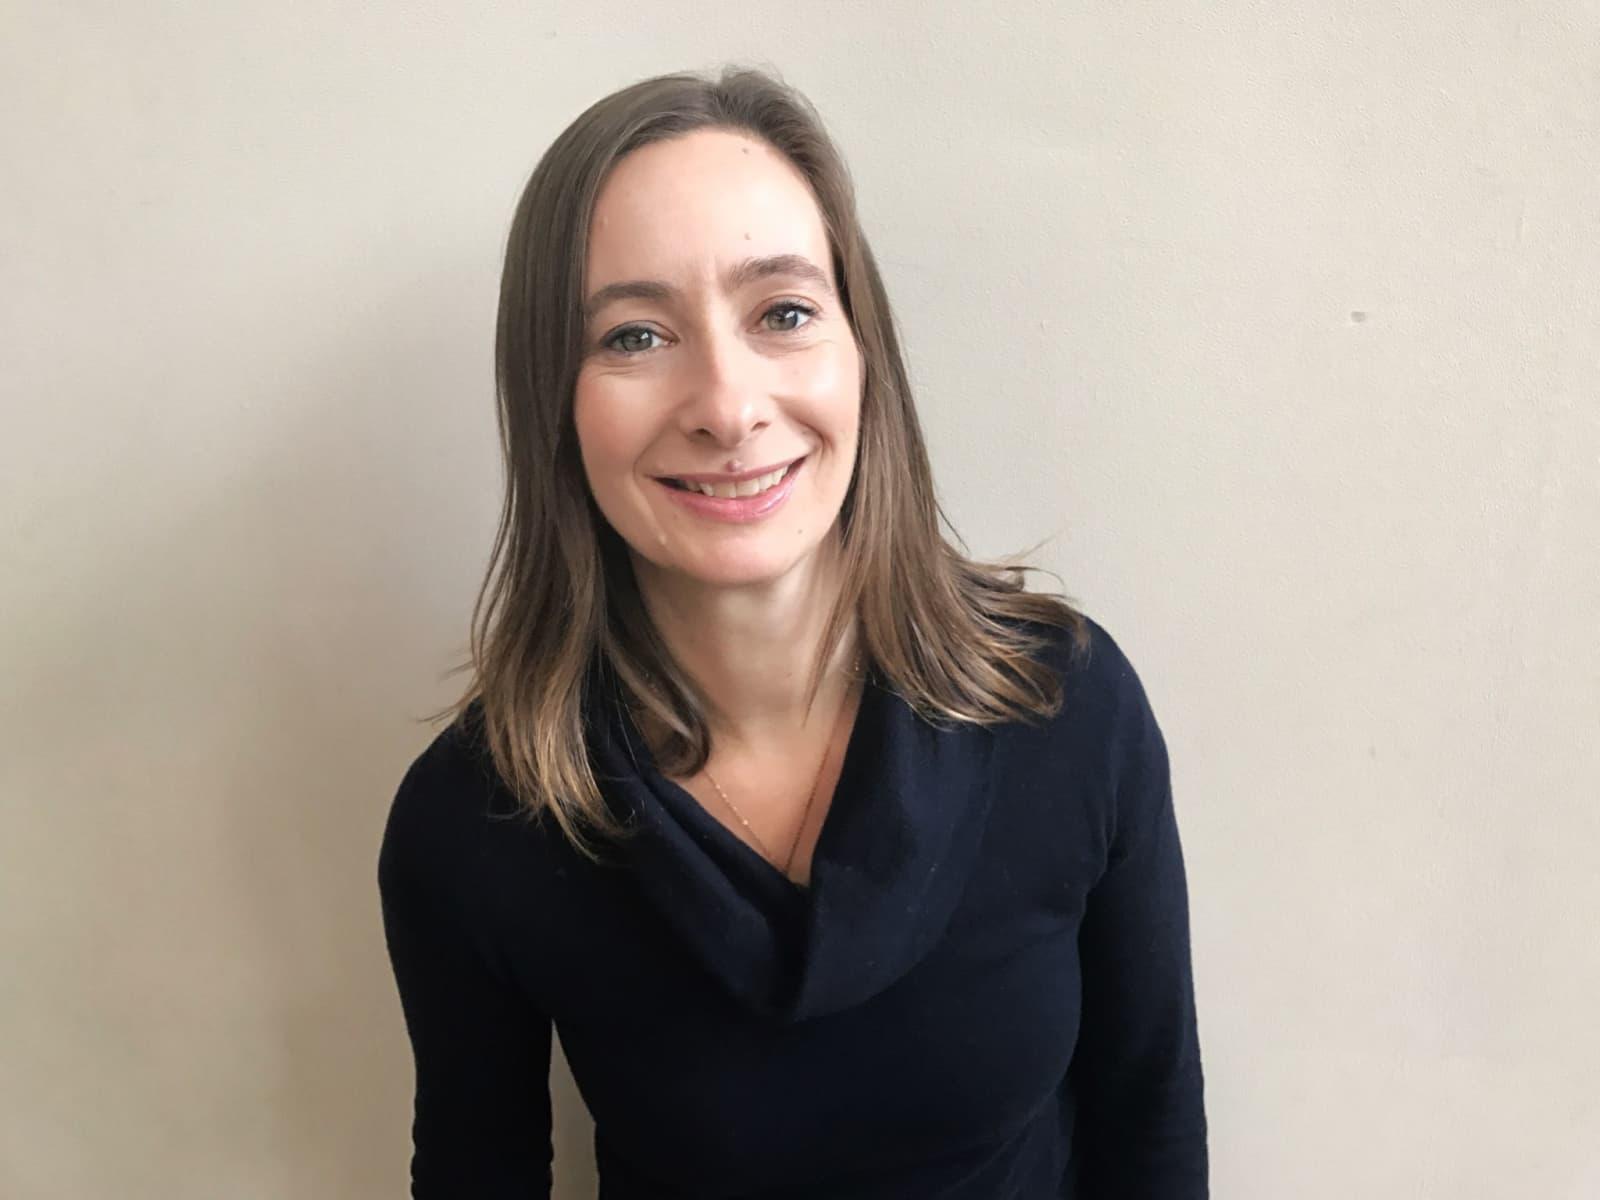 Helene from Montréal, Quebec, Canada